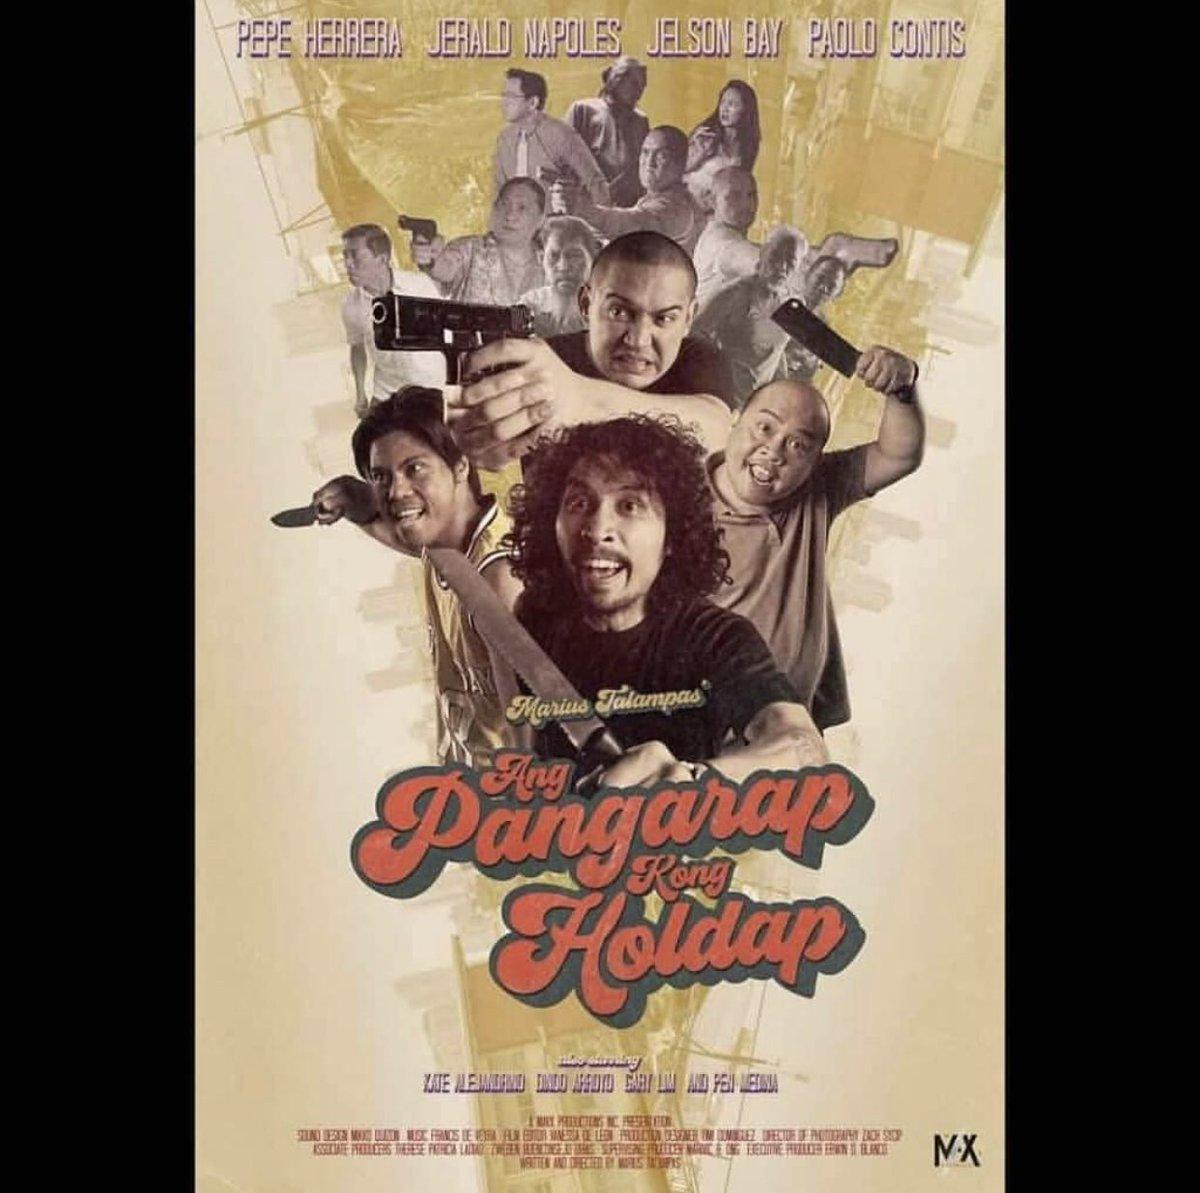 Catch Pepe Herrera in #AngPangarapKongHoldap this November 28 in cinemas nationwide! #APKH